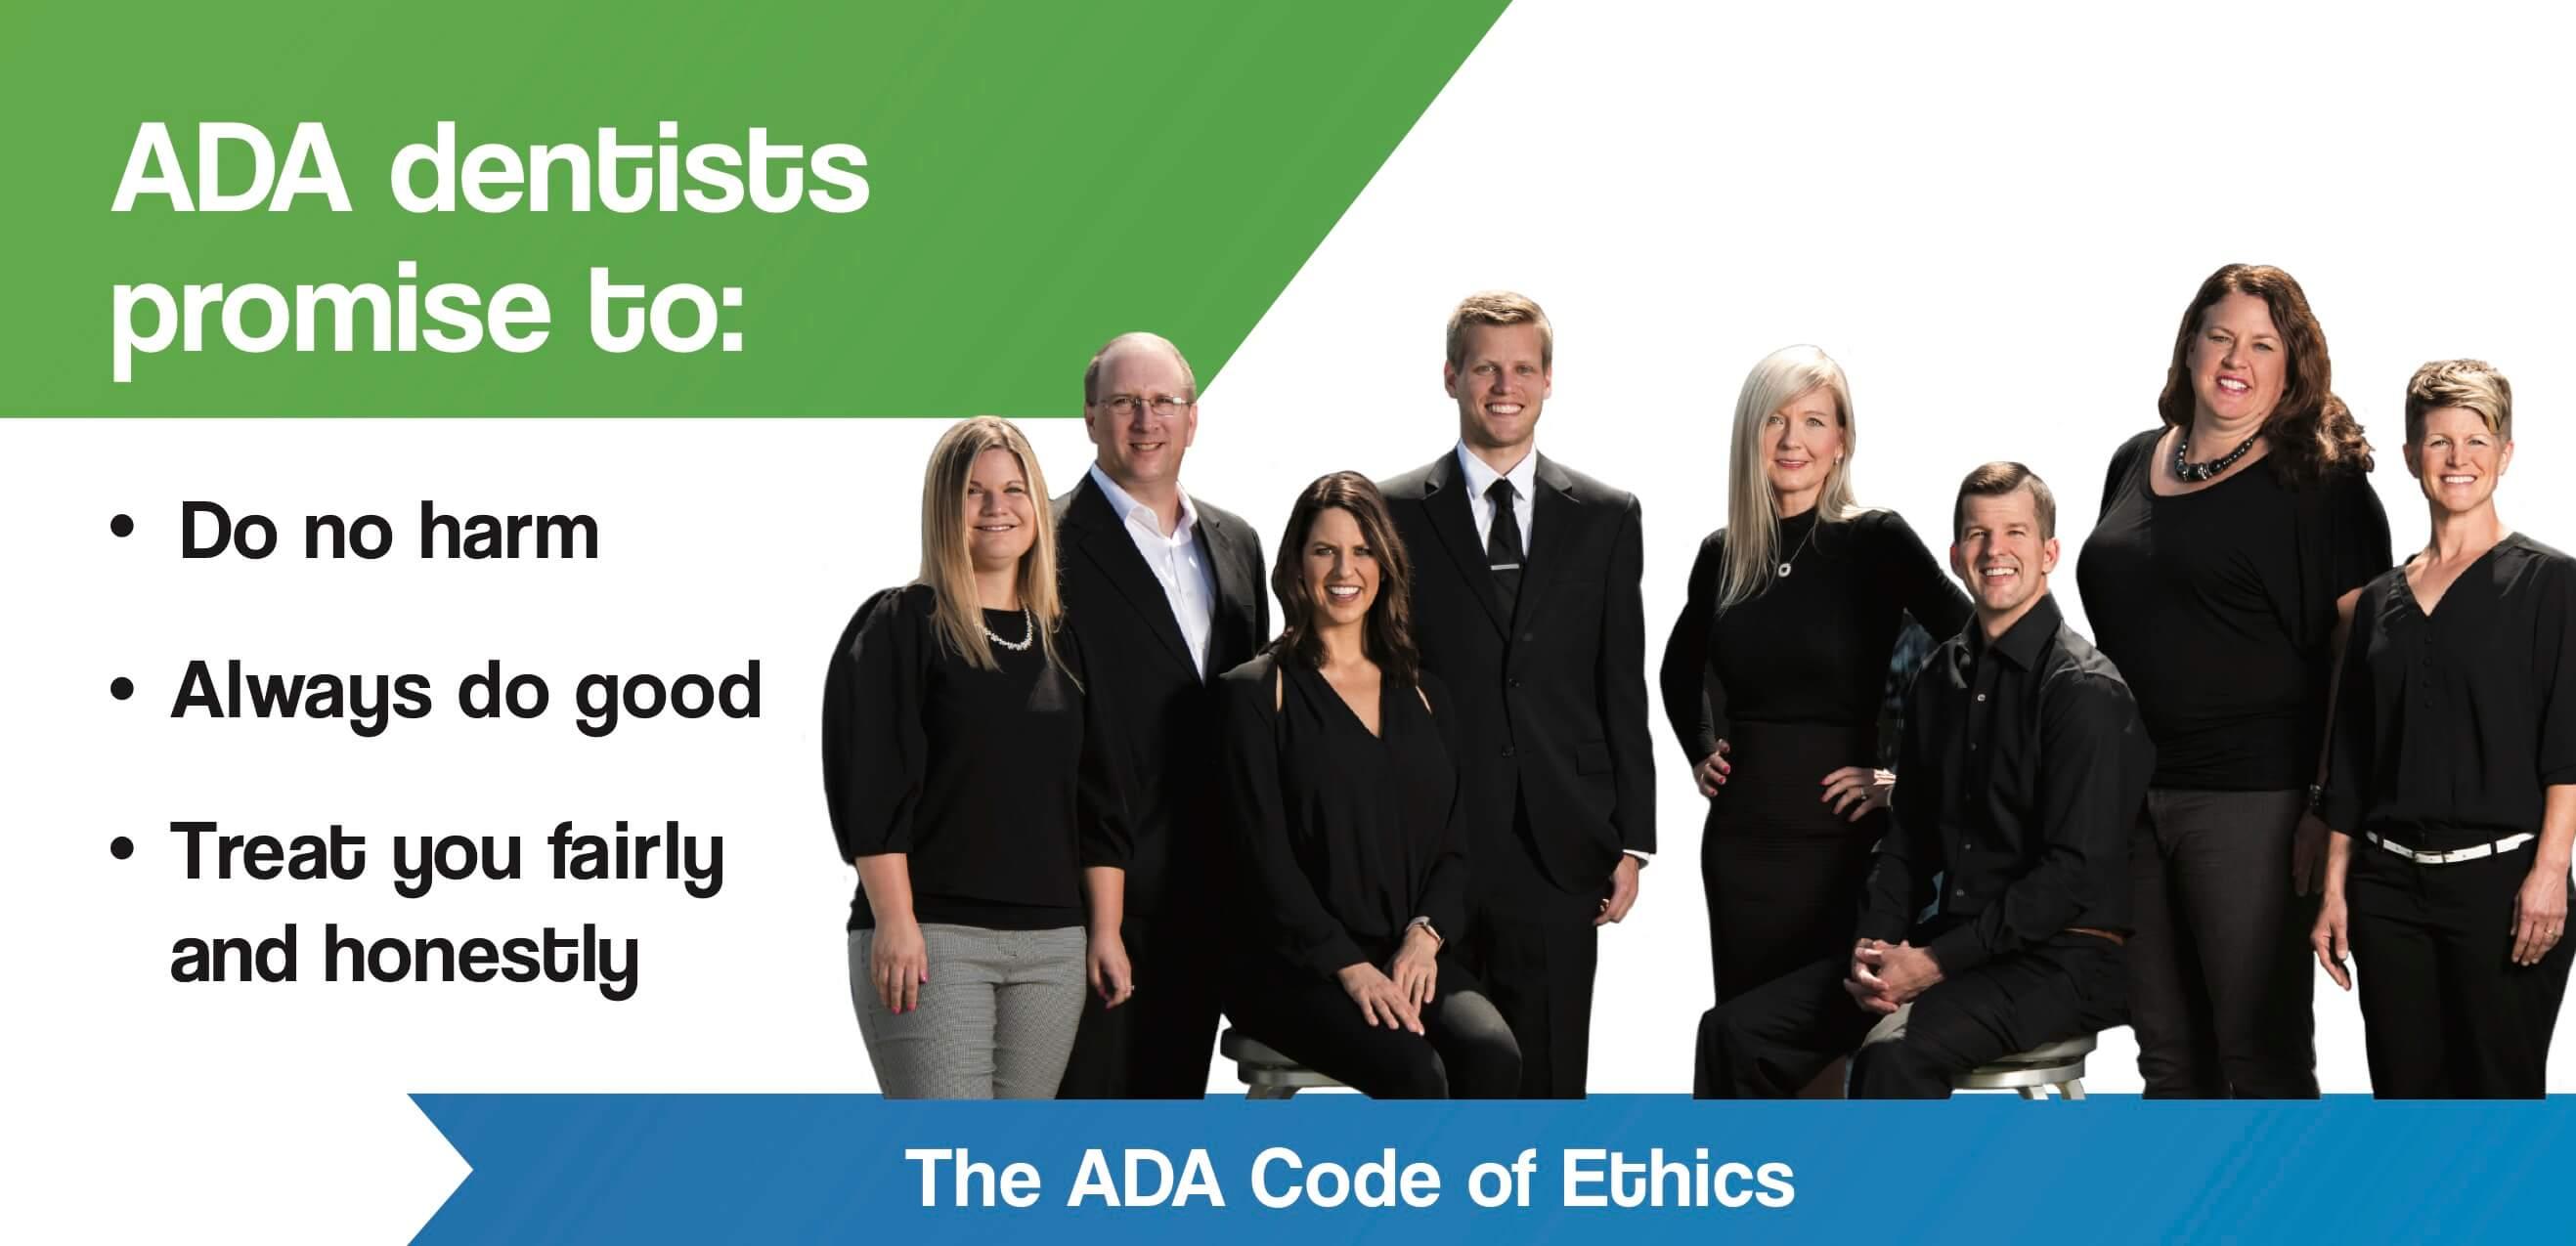 ada code of ethics nfd team